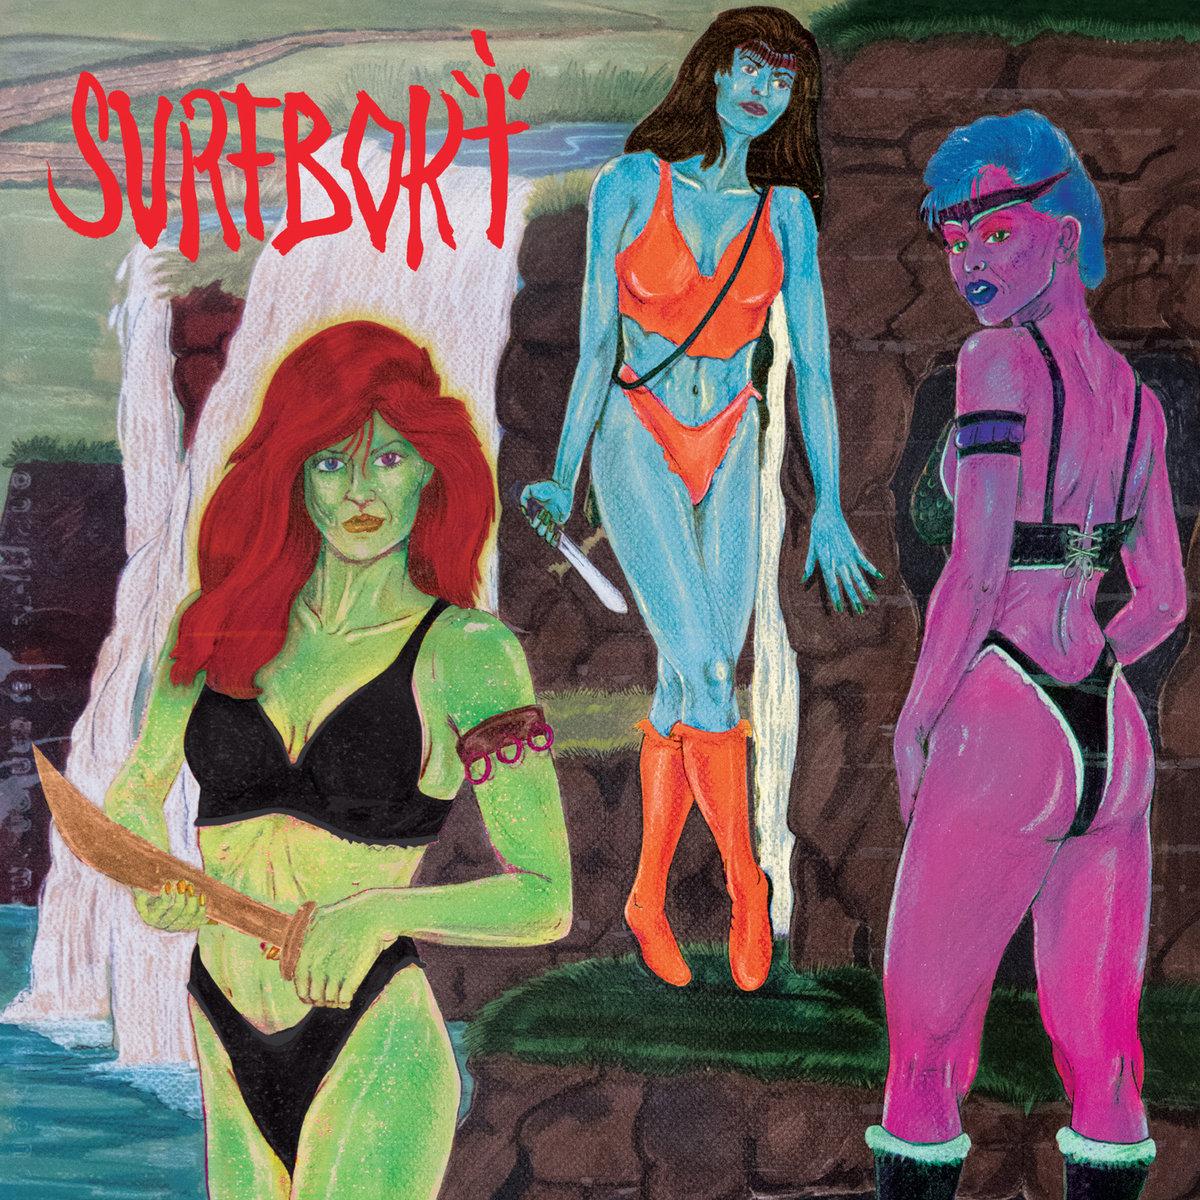 SURFBORT - Friendship Music